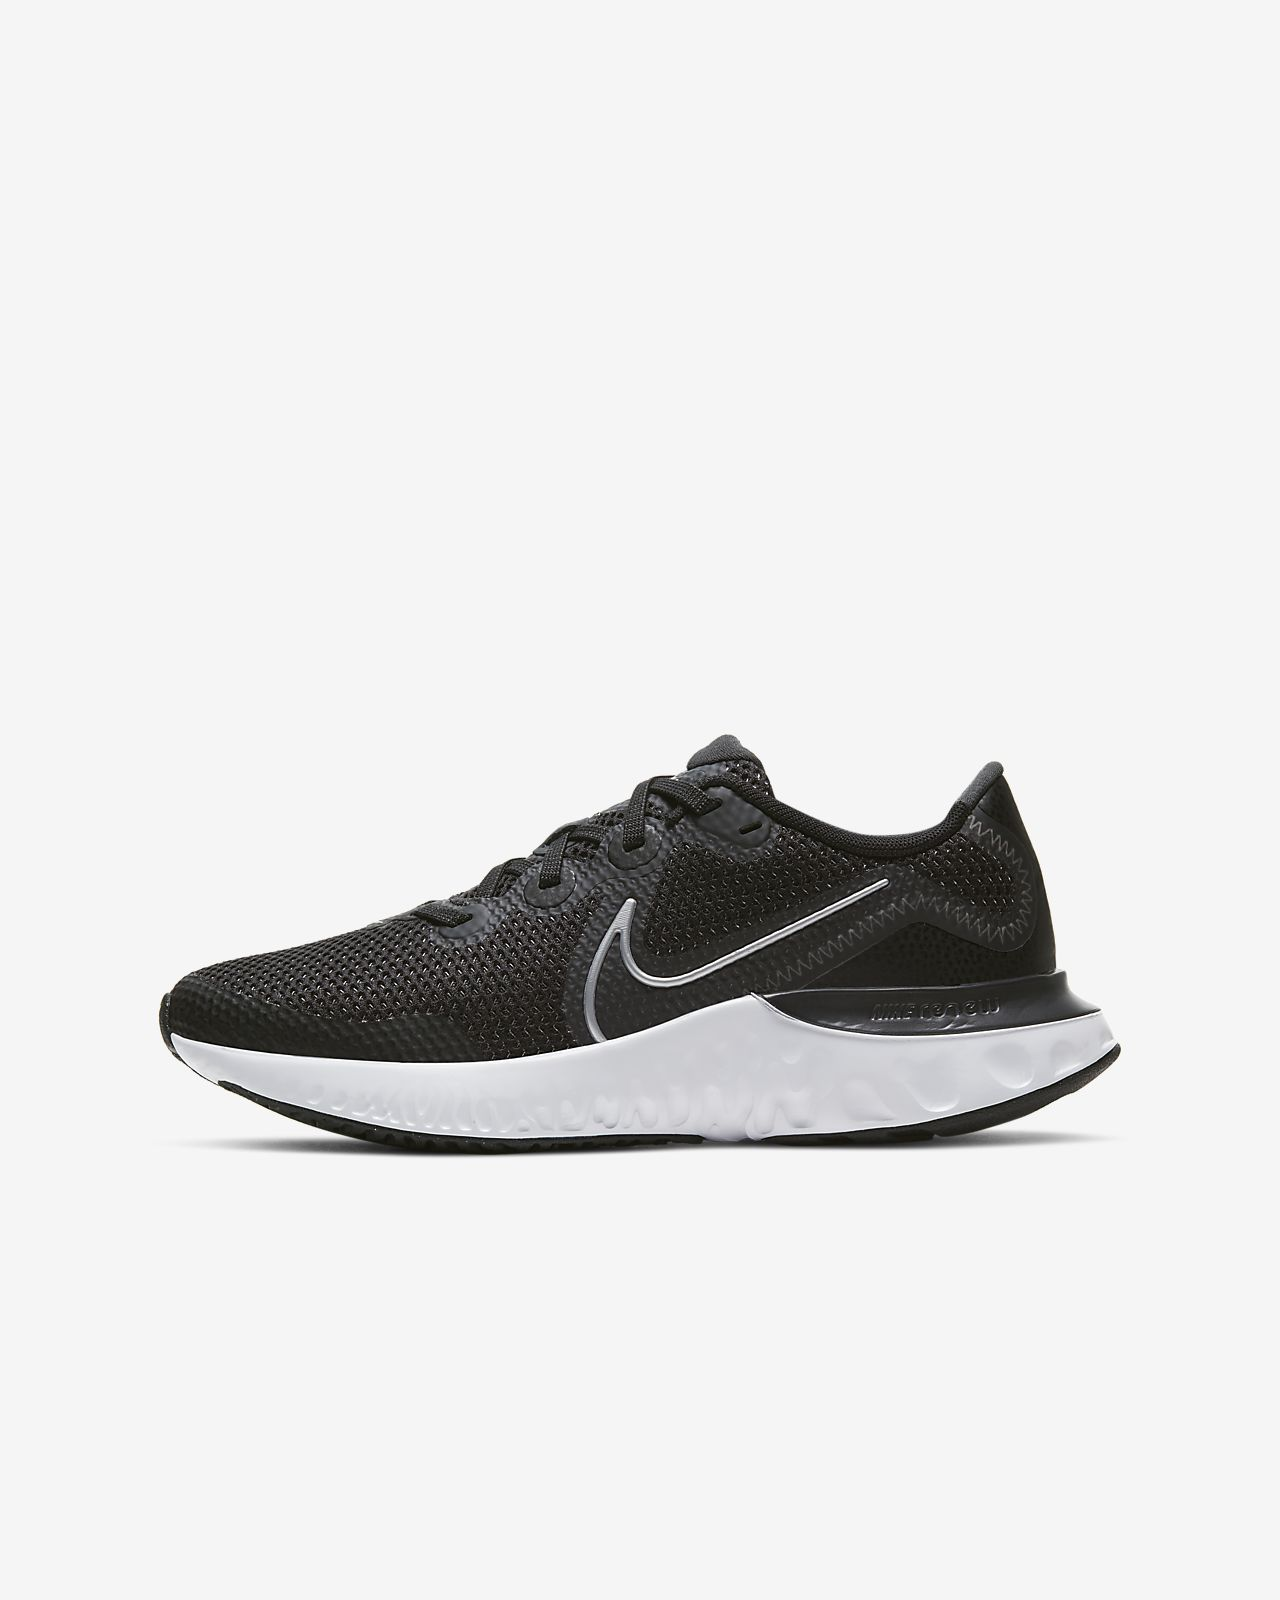 Calzado de running para niños talla grande Nike Renew